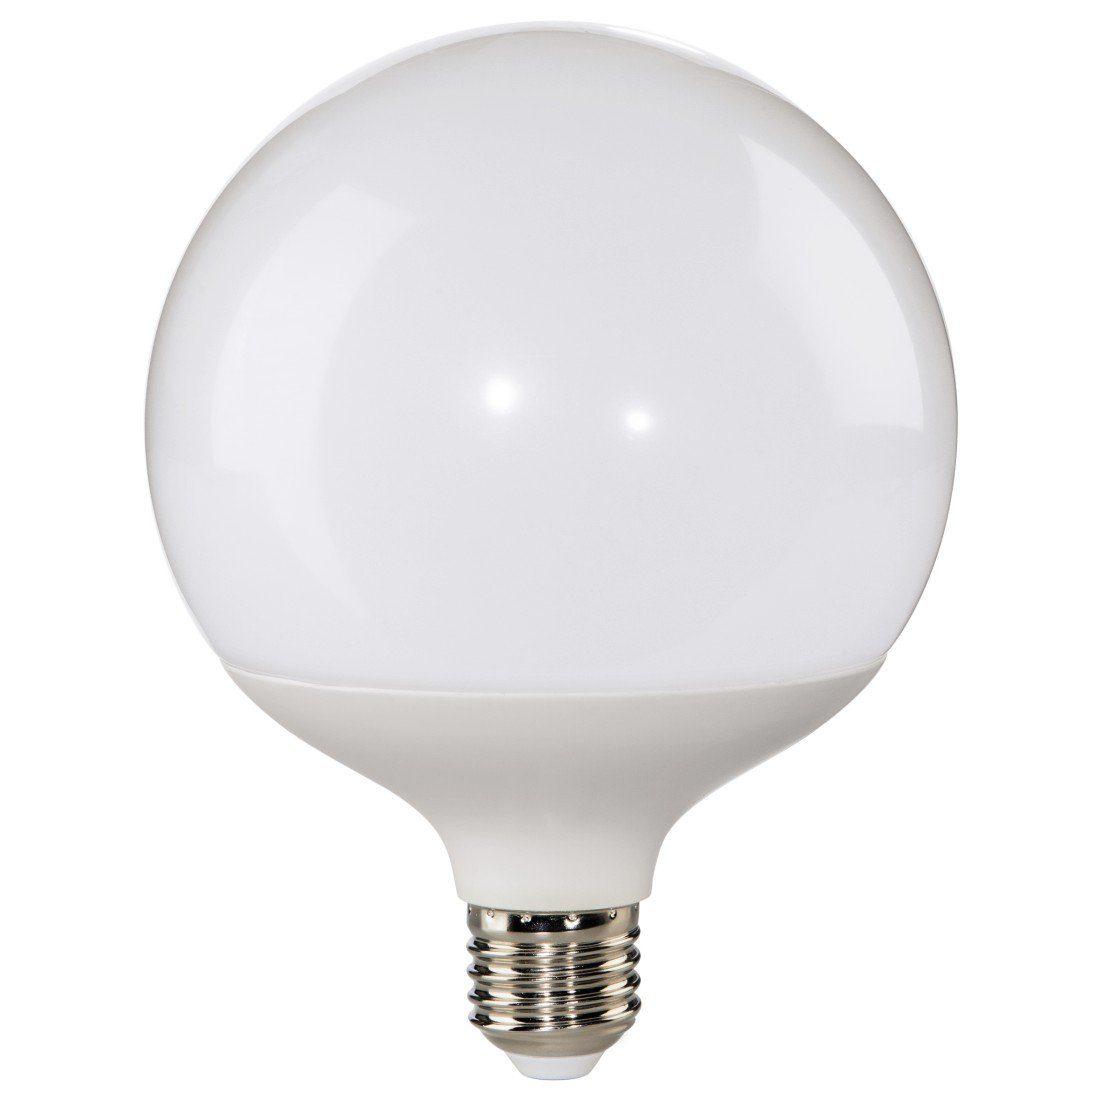 Xavax LED-Lampe, 16W, Globe, E27, dimmbar, Warmweiß